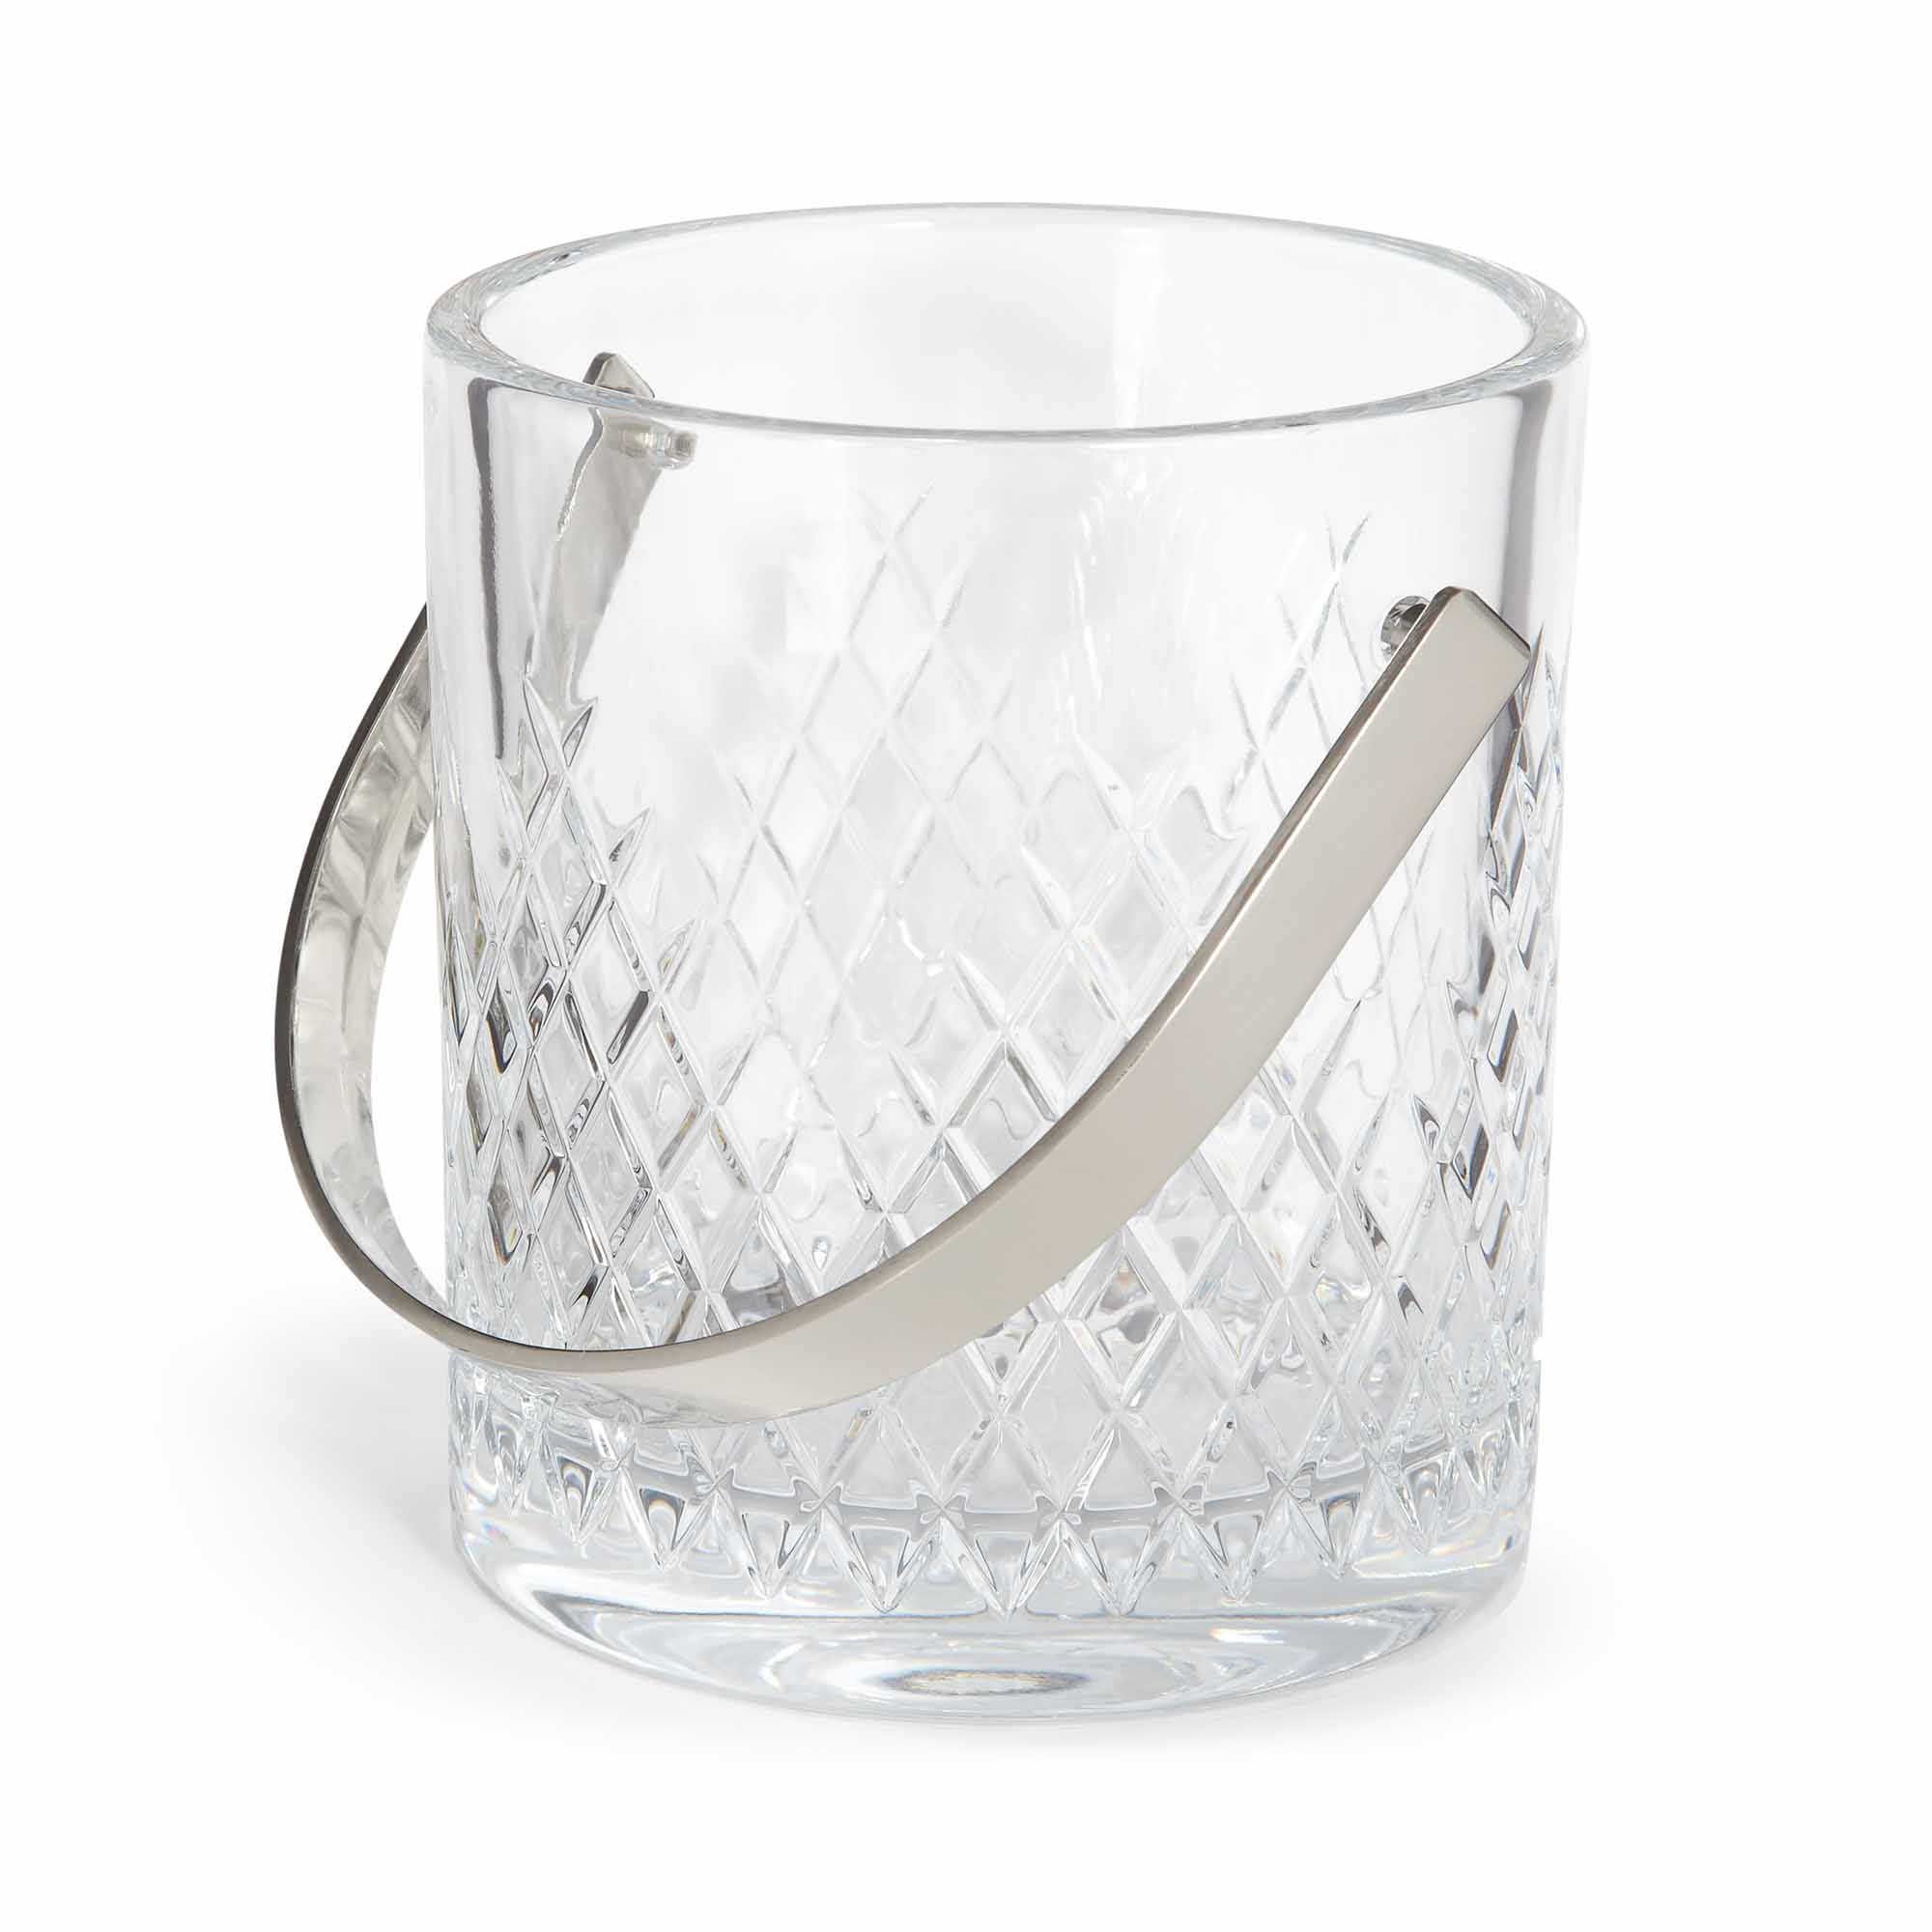 Soho Home Crystal ice bucket £125